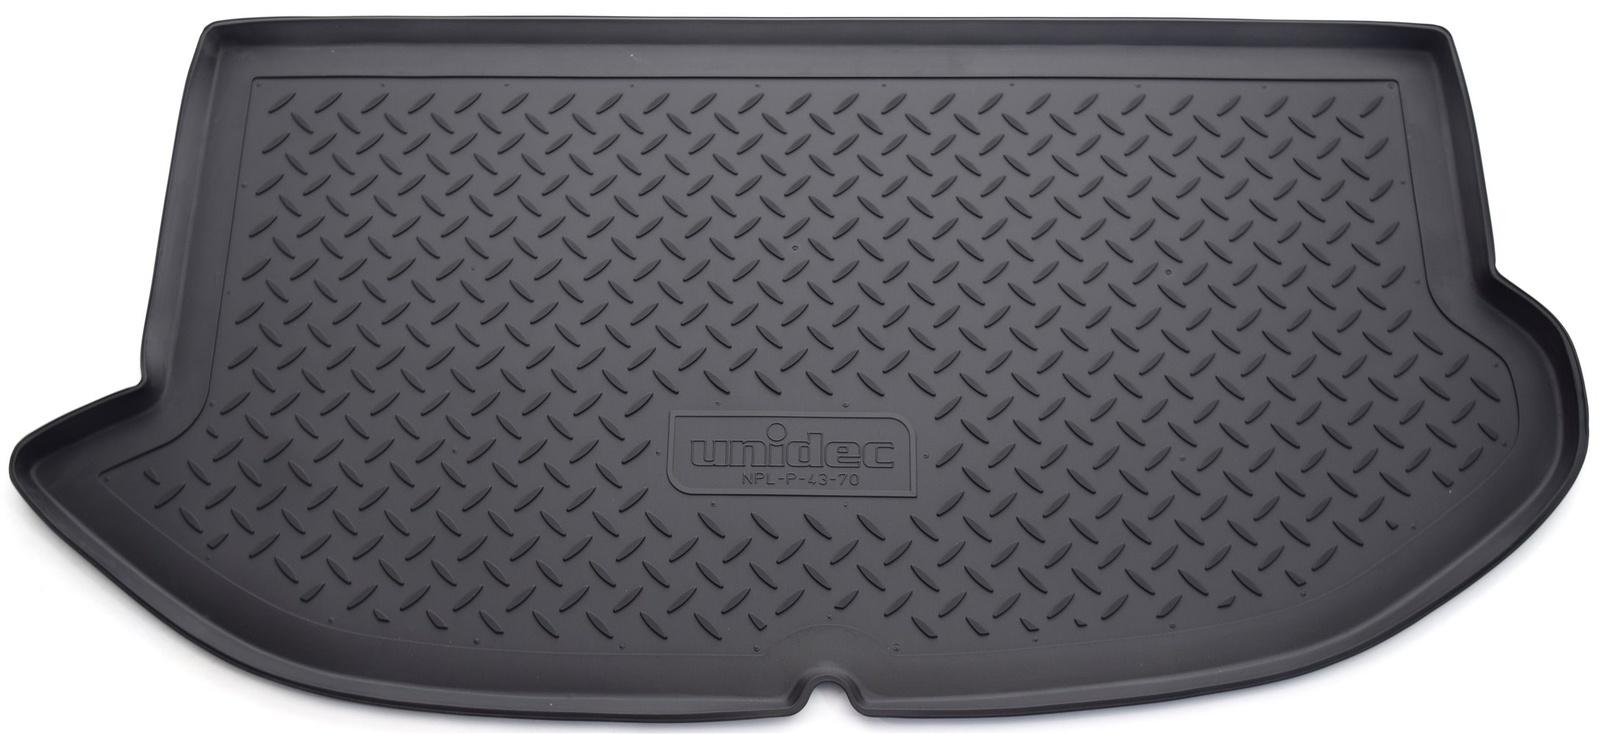 Коврик багажника Norplast для Kia Soul AM HB 2008-2013, NPL-P-43-70, черный